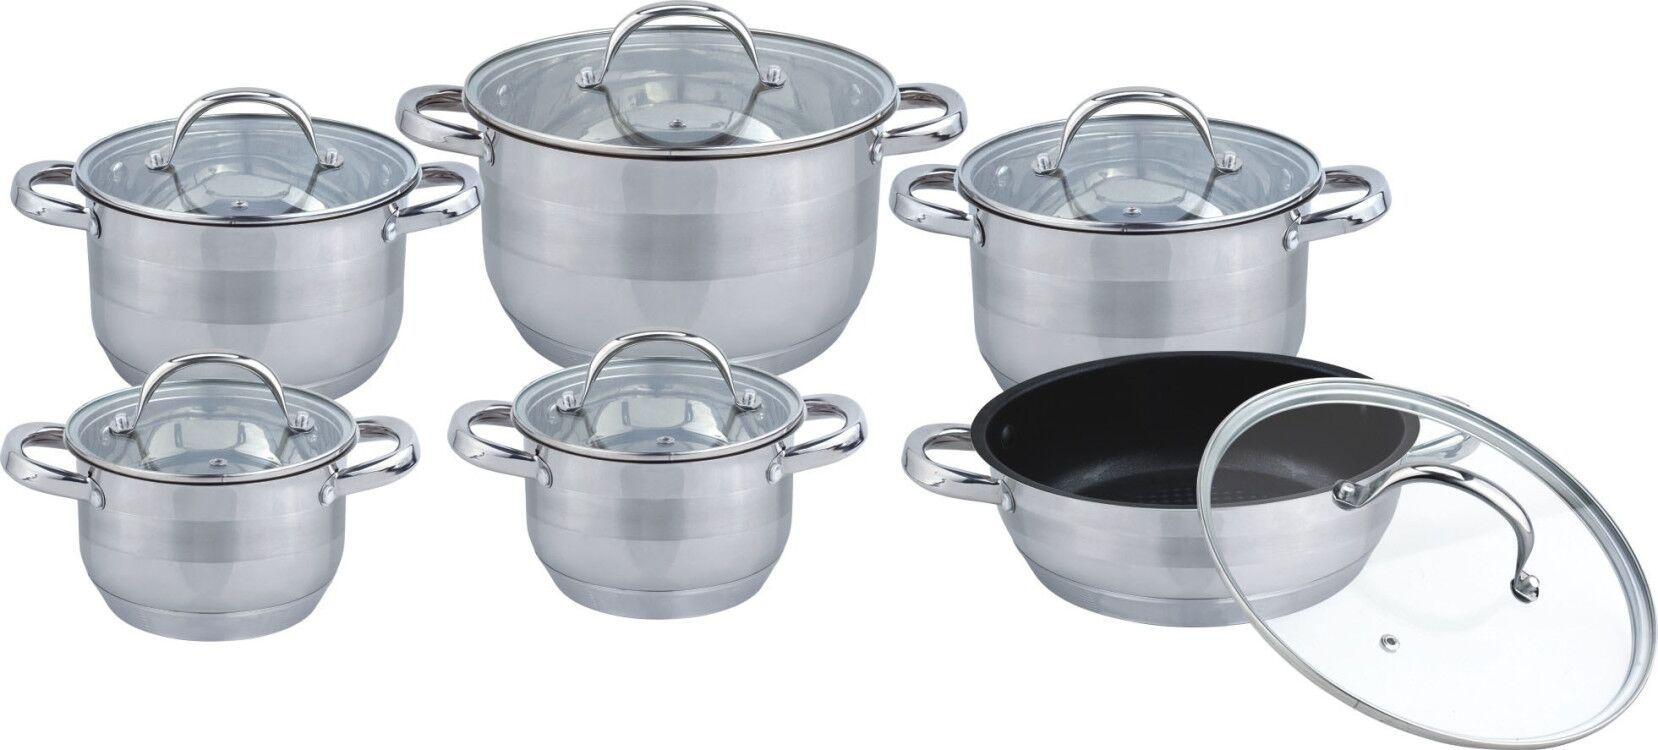 Straigt shape cookware set